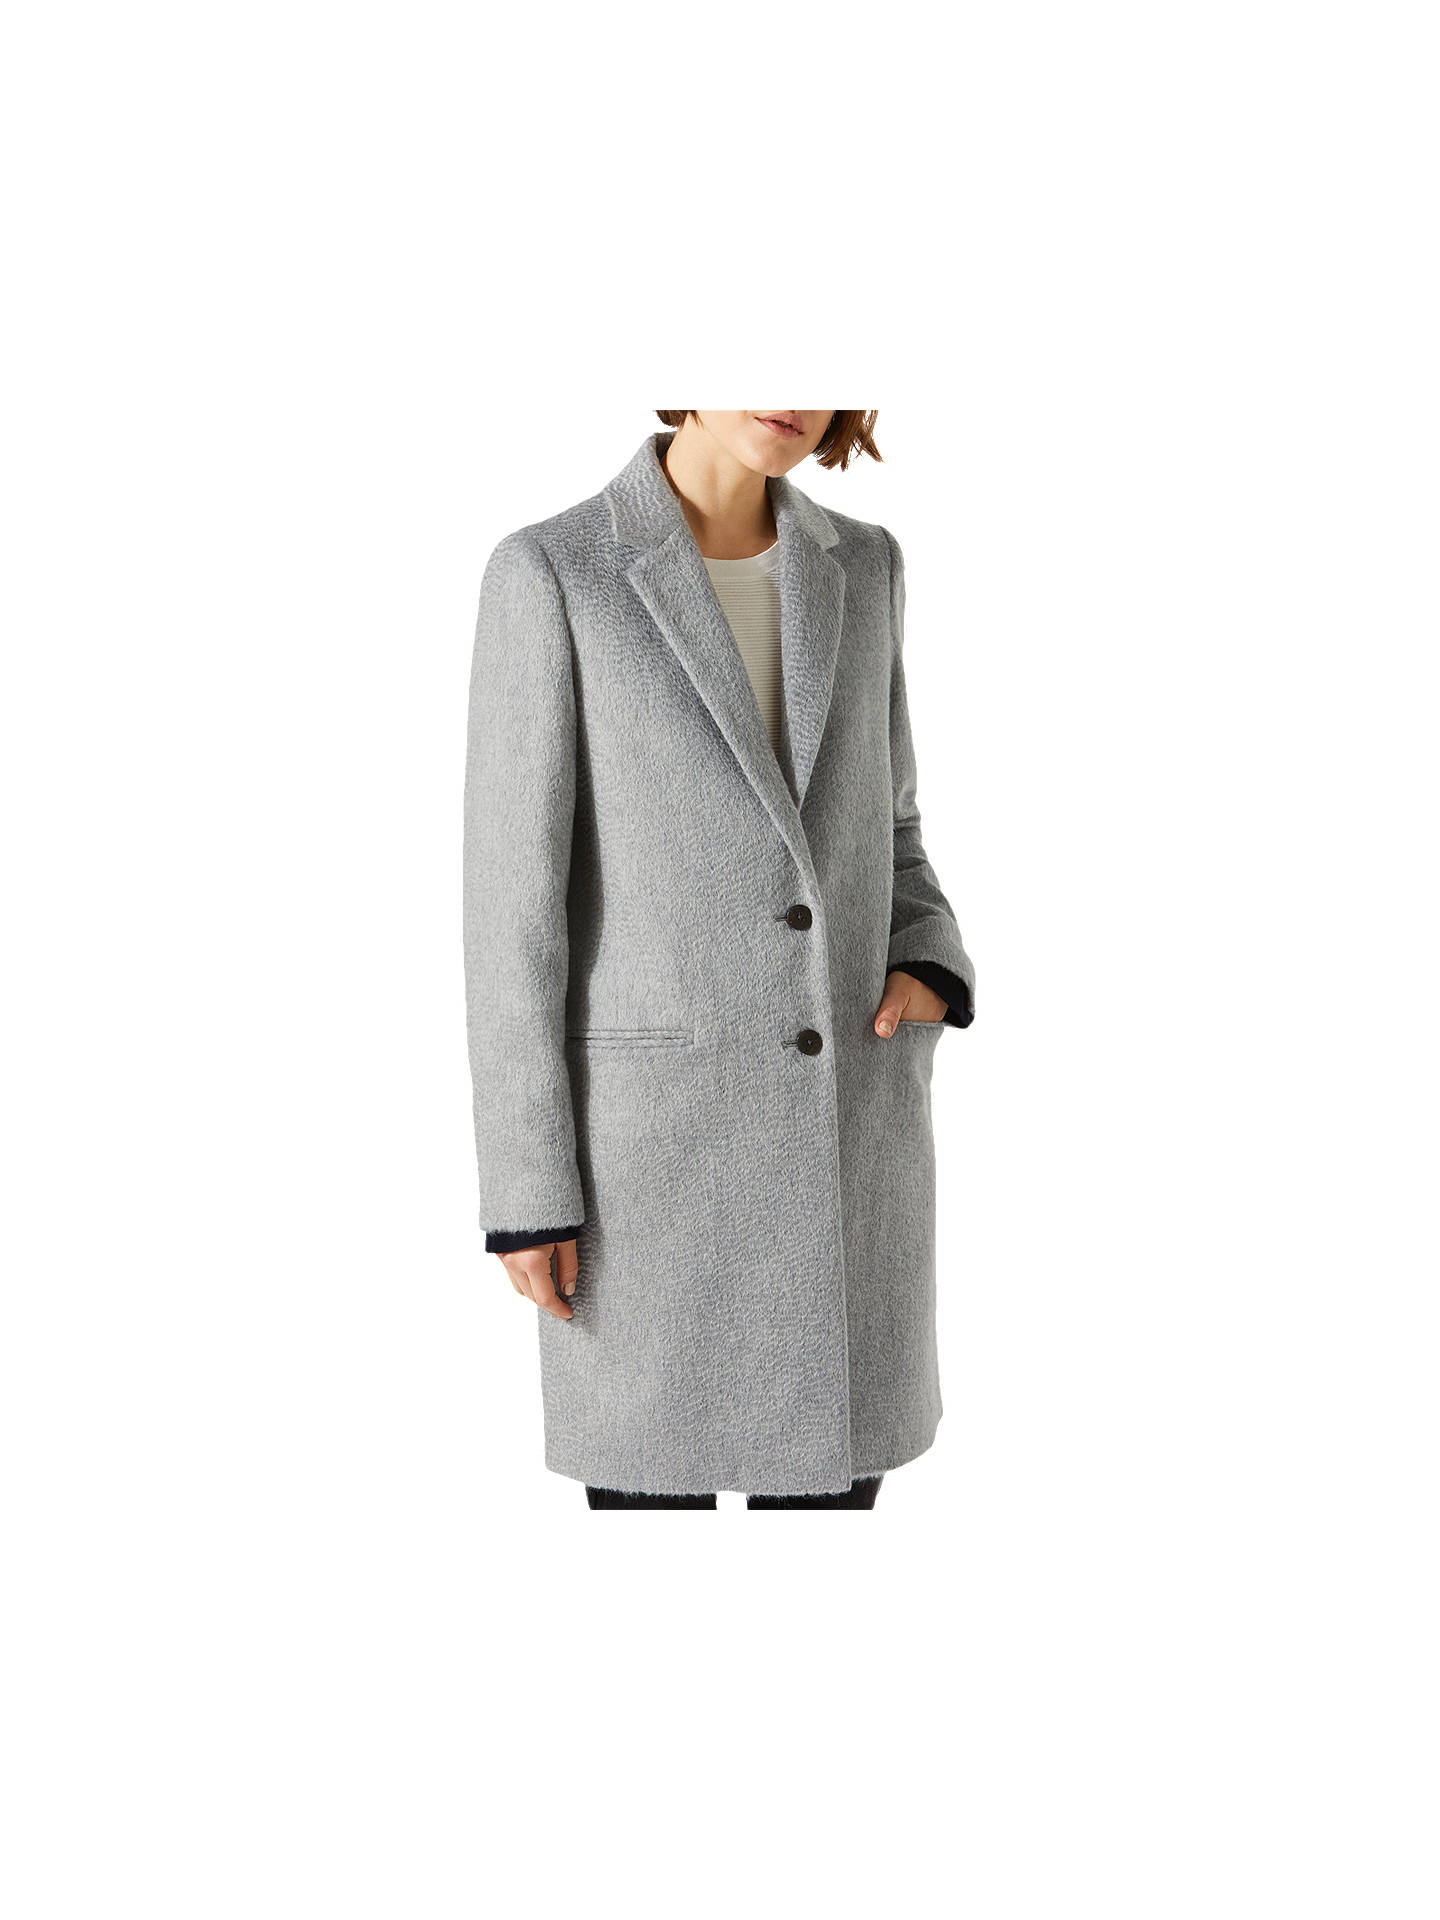 08f3e193b032 Jigsaw Single Breasted City Wool Coat at John Lewis   Partners